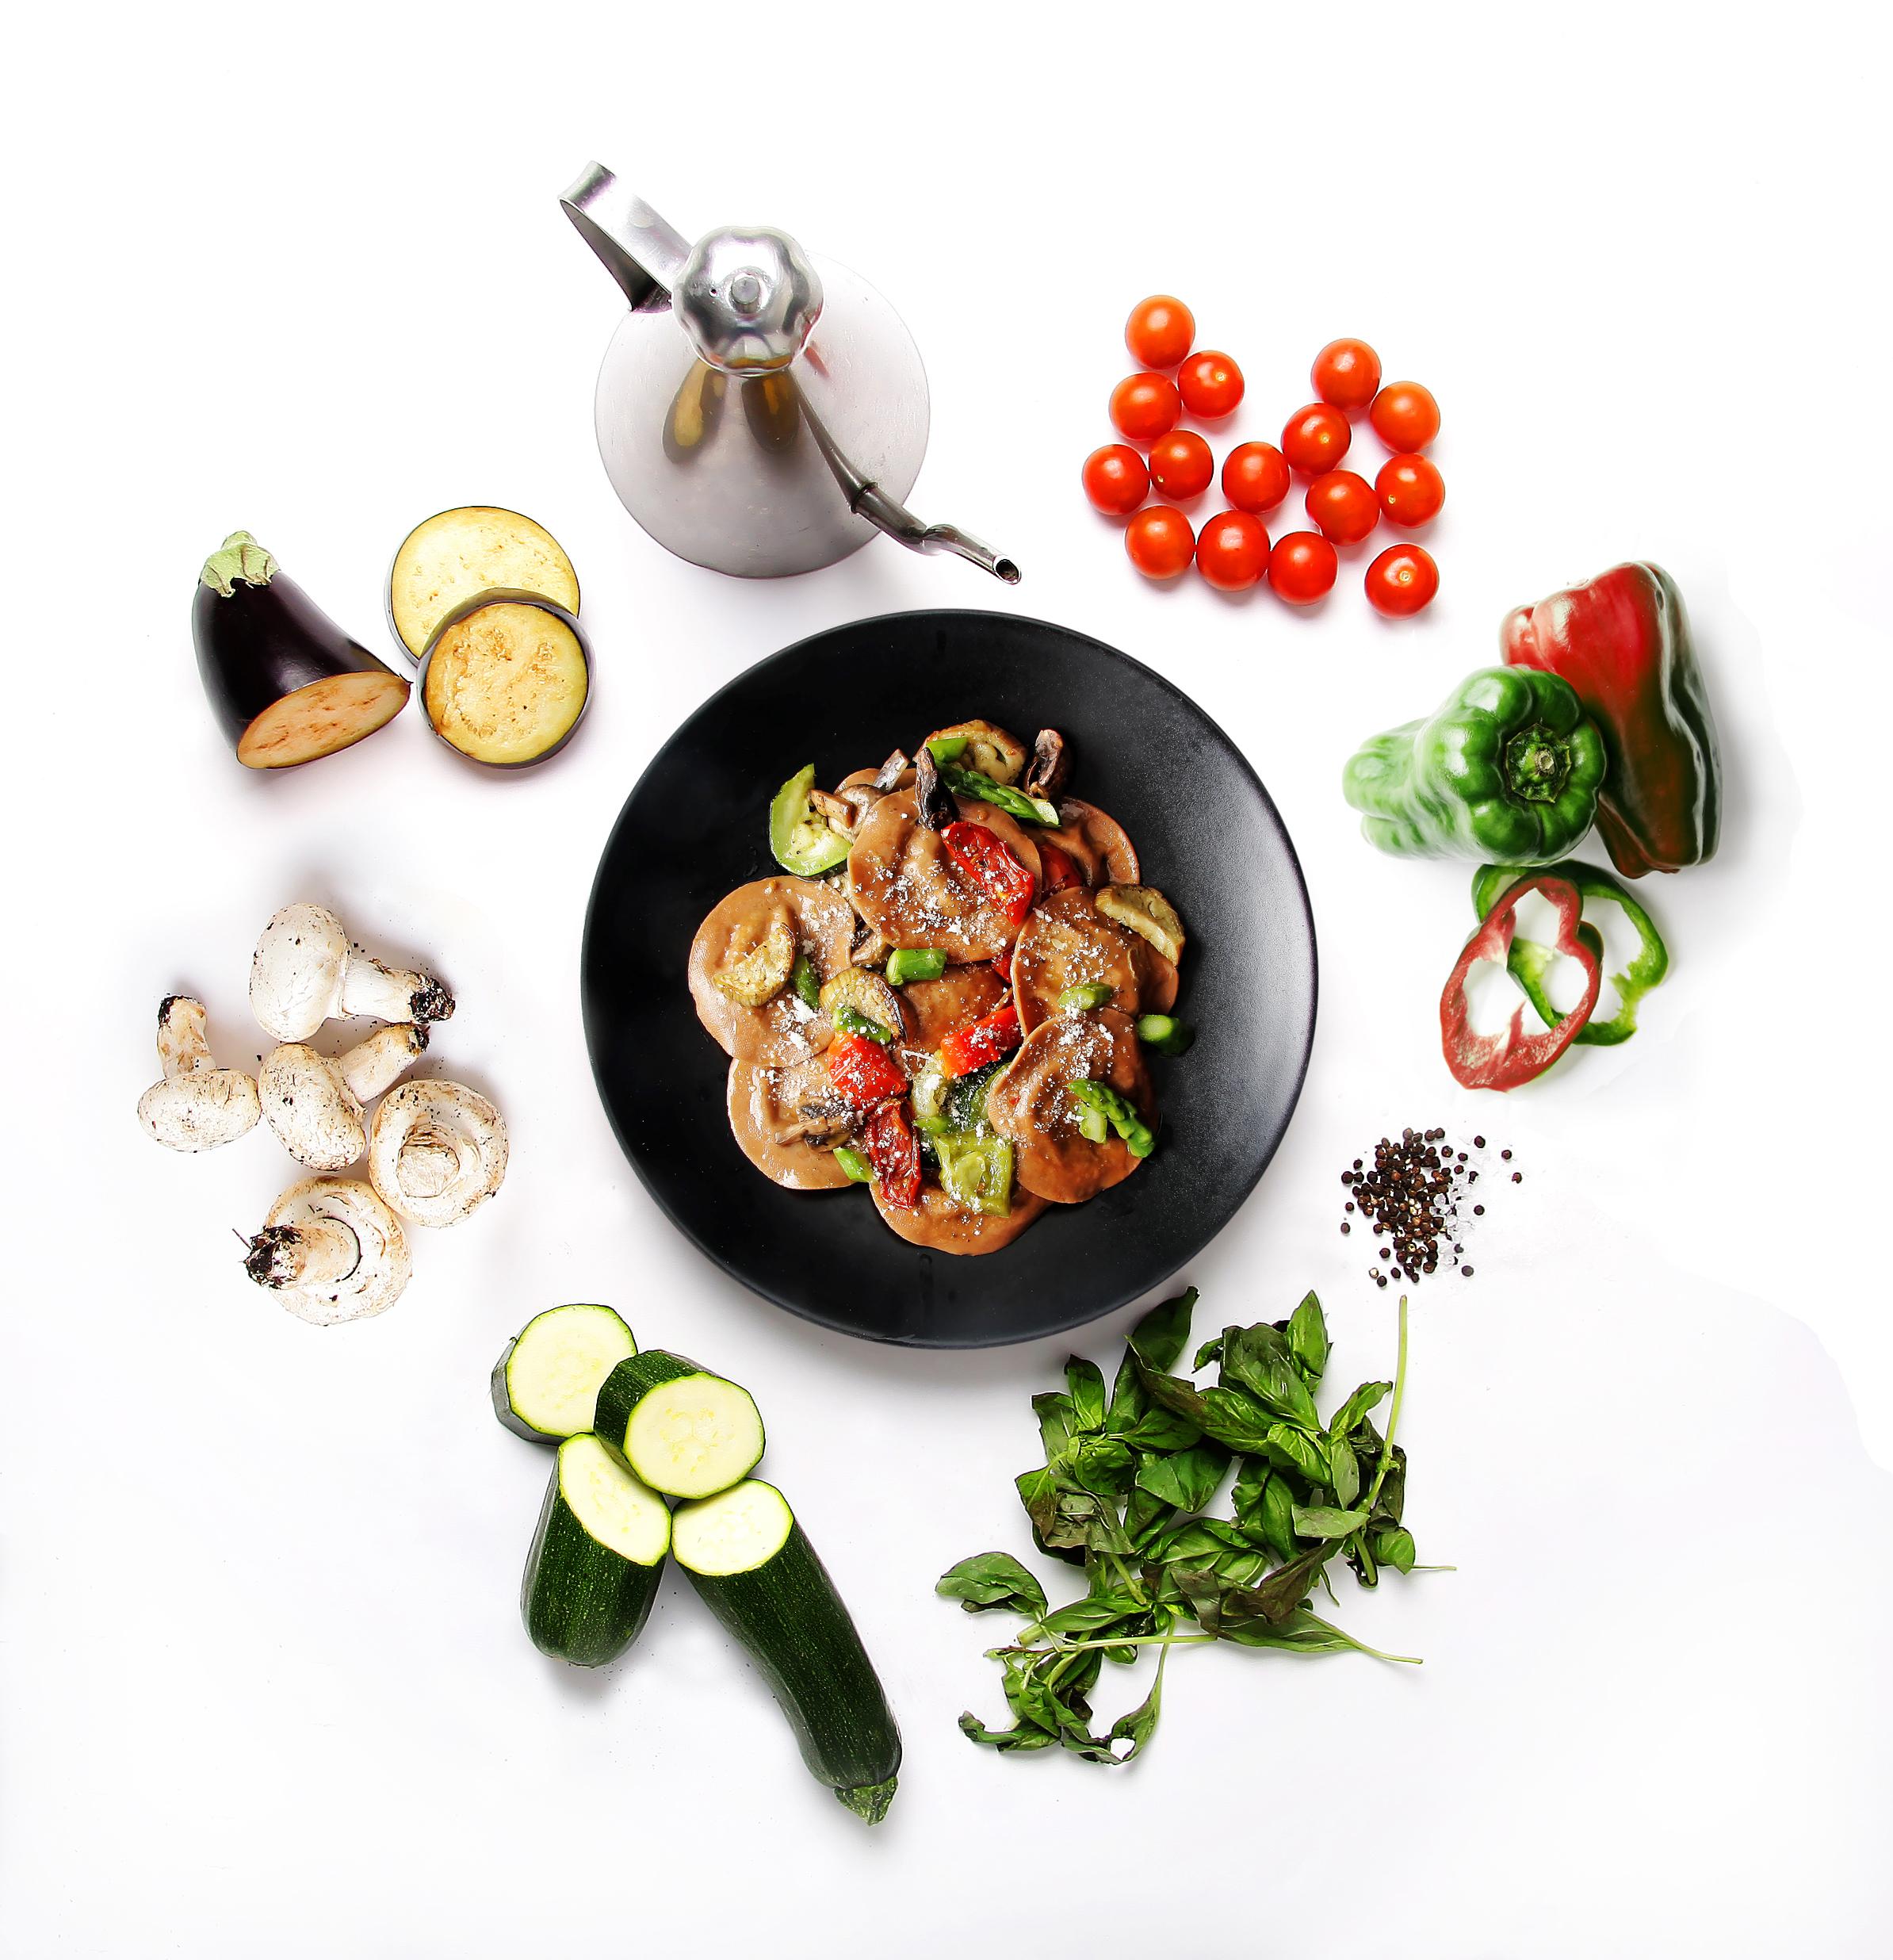 bodegonpastafinal - Tomate y cocina mediterránea, un tándem indisoluble